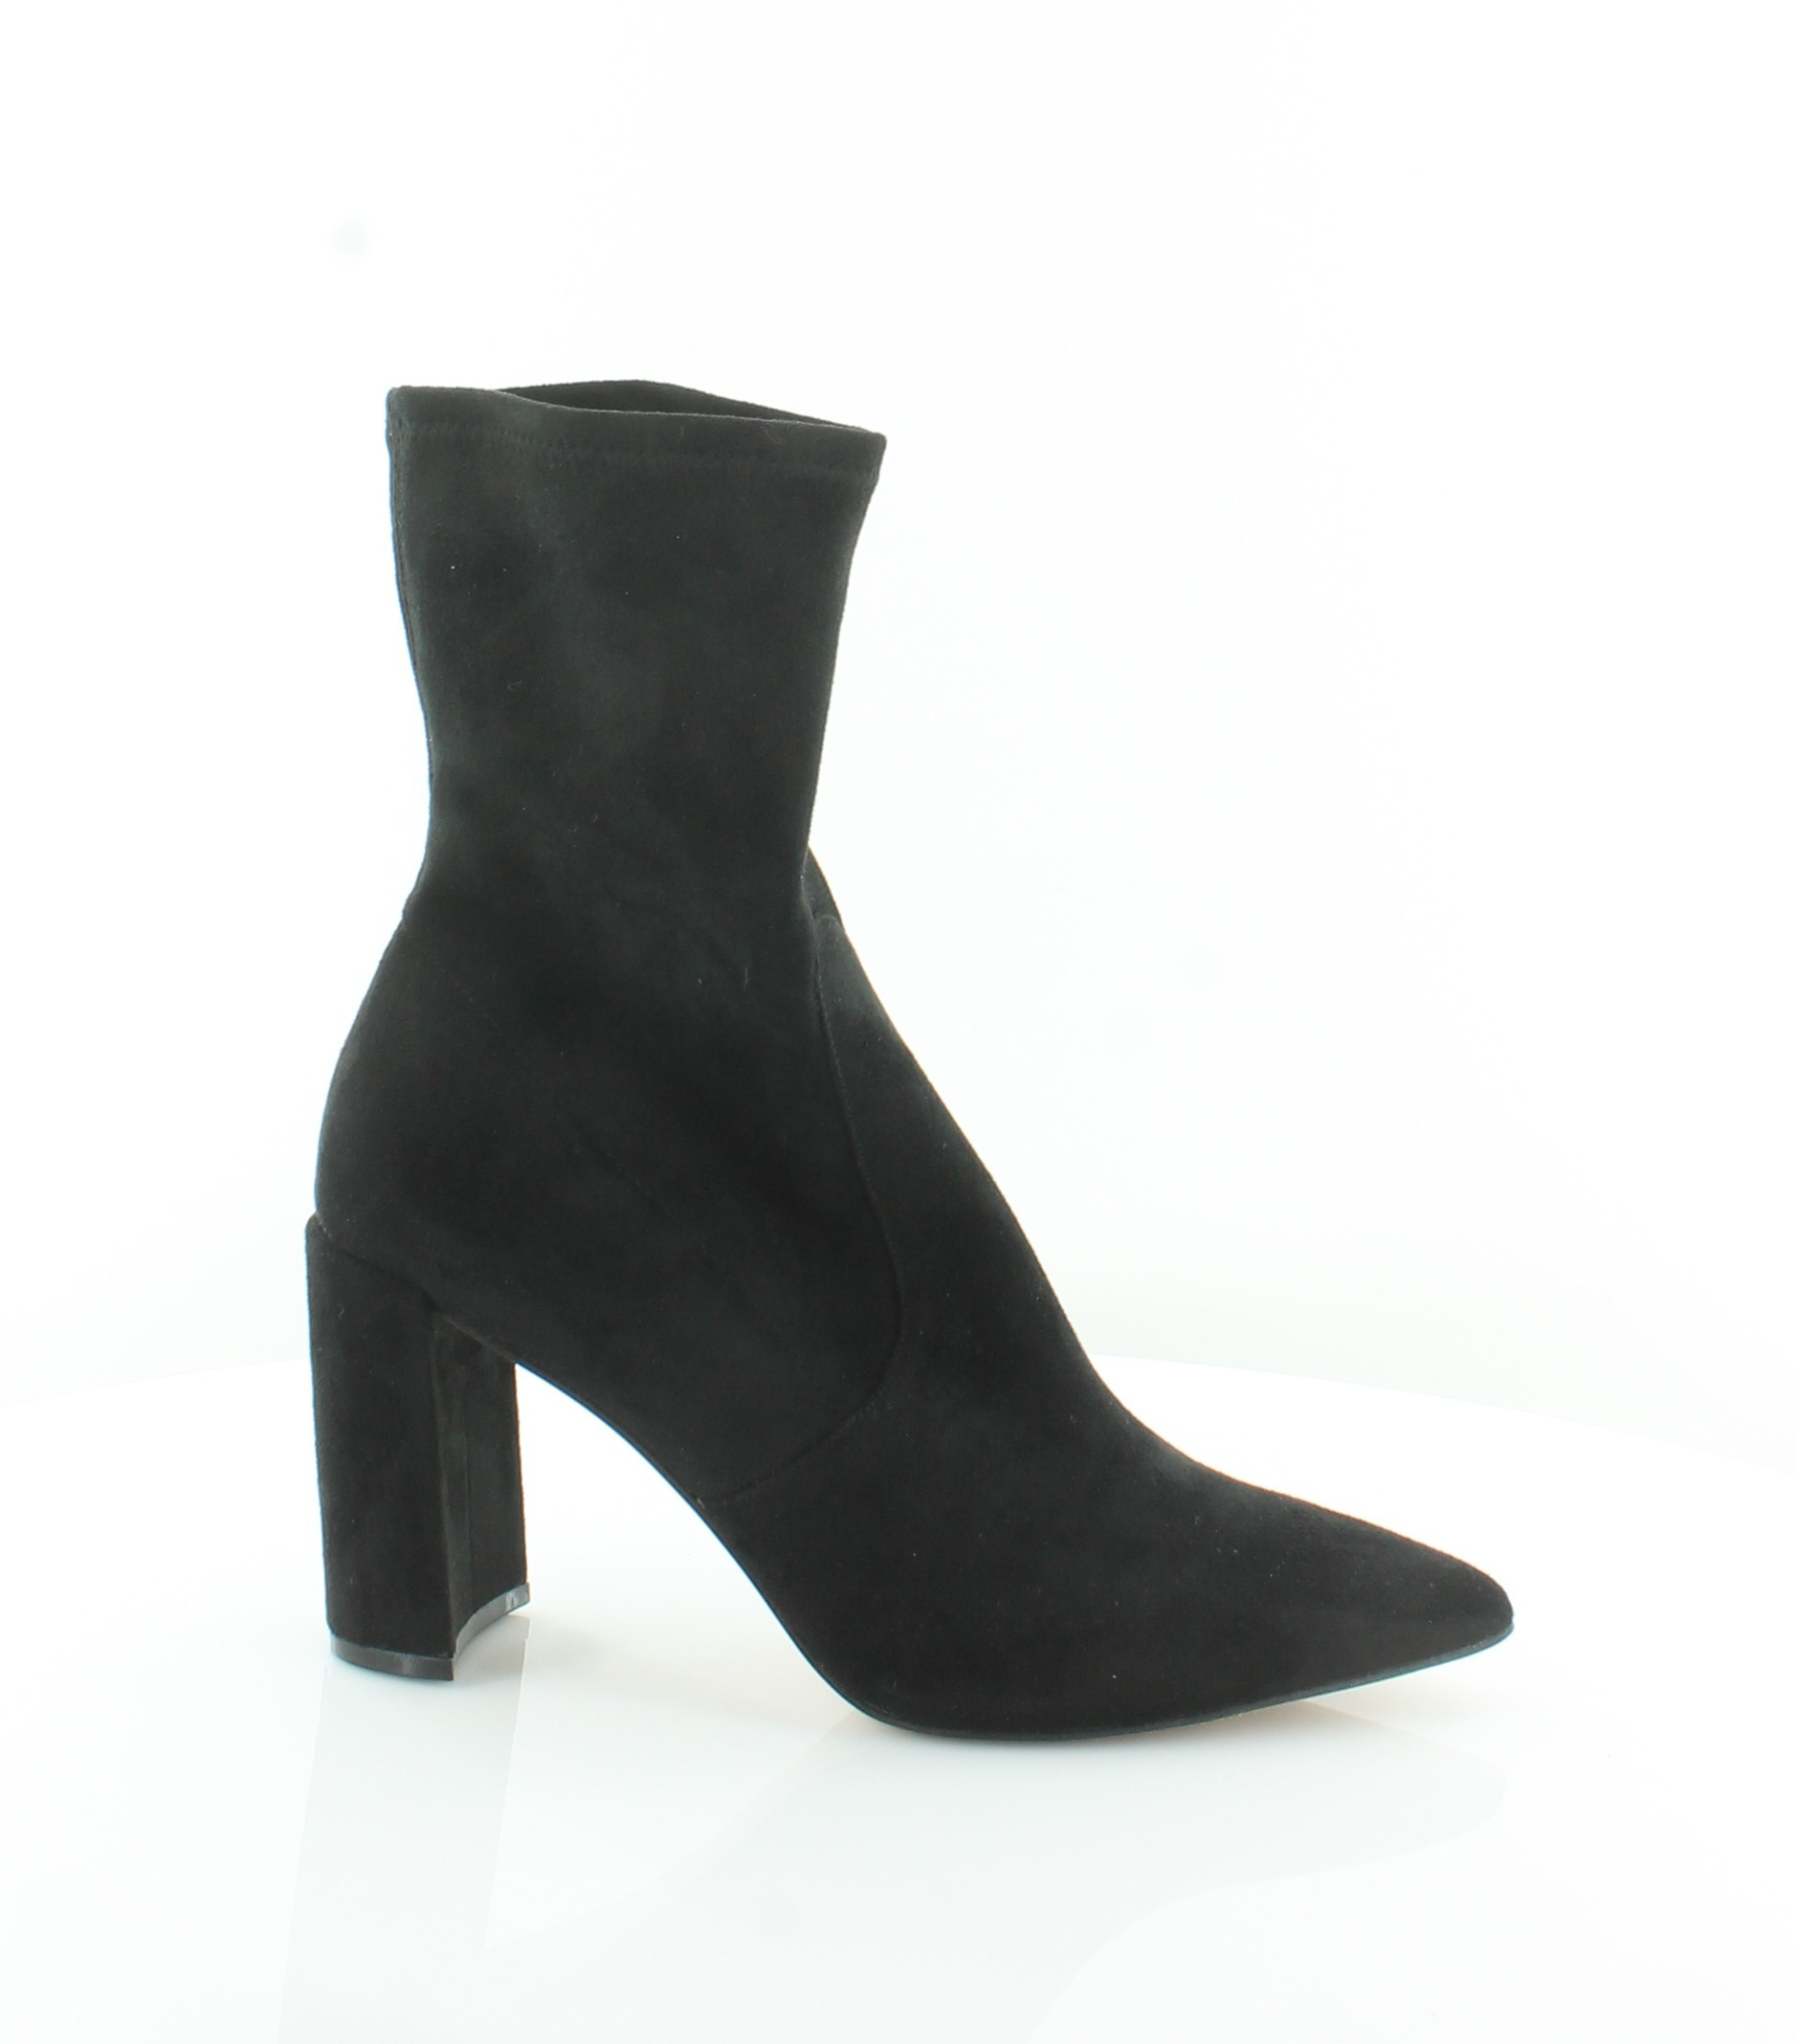 INC International Concepts Savina noir chaussures Pointure 10 M bottes PDSF  119.5